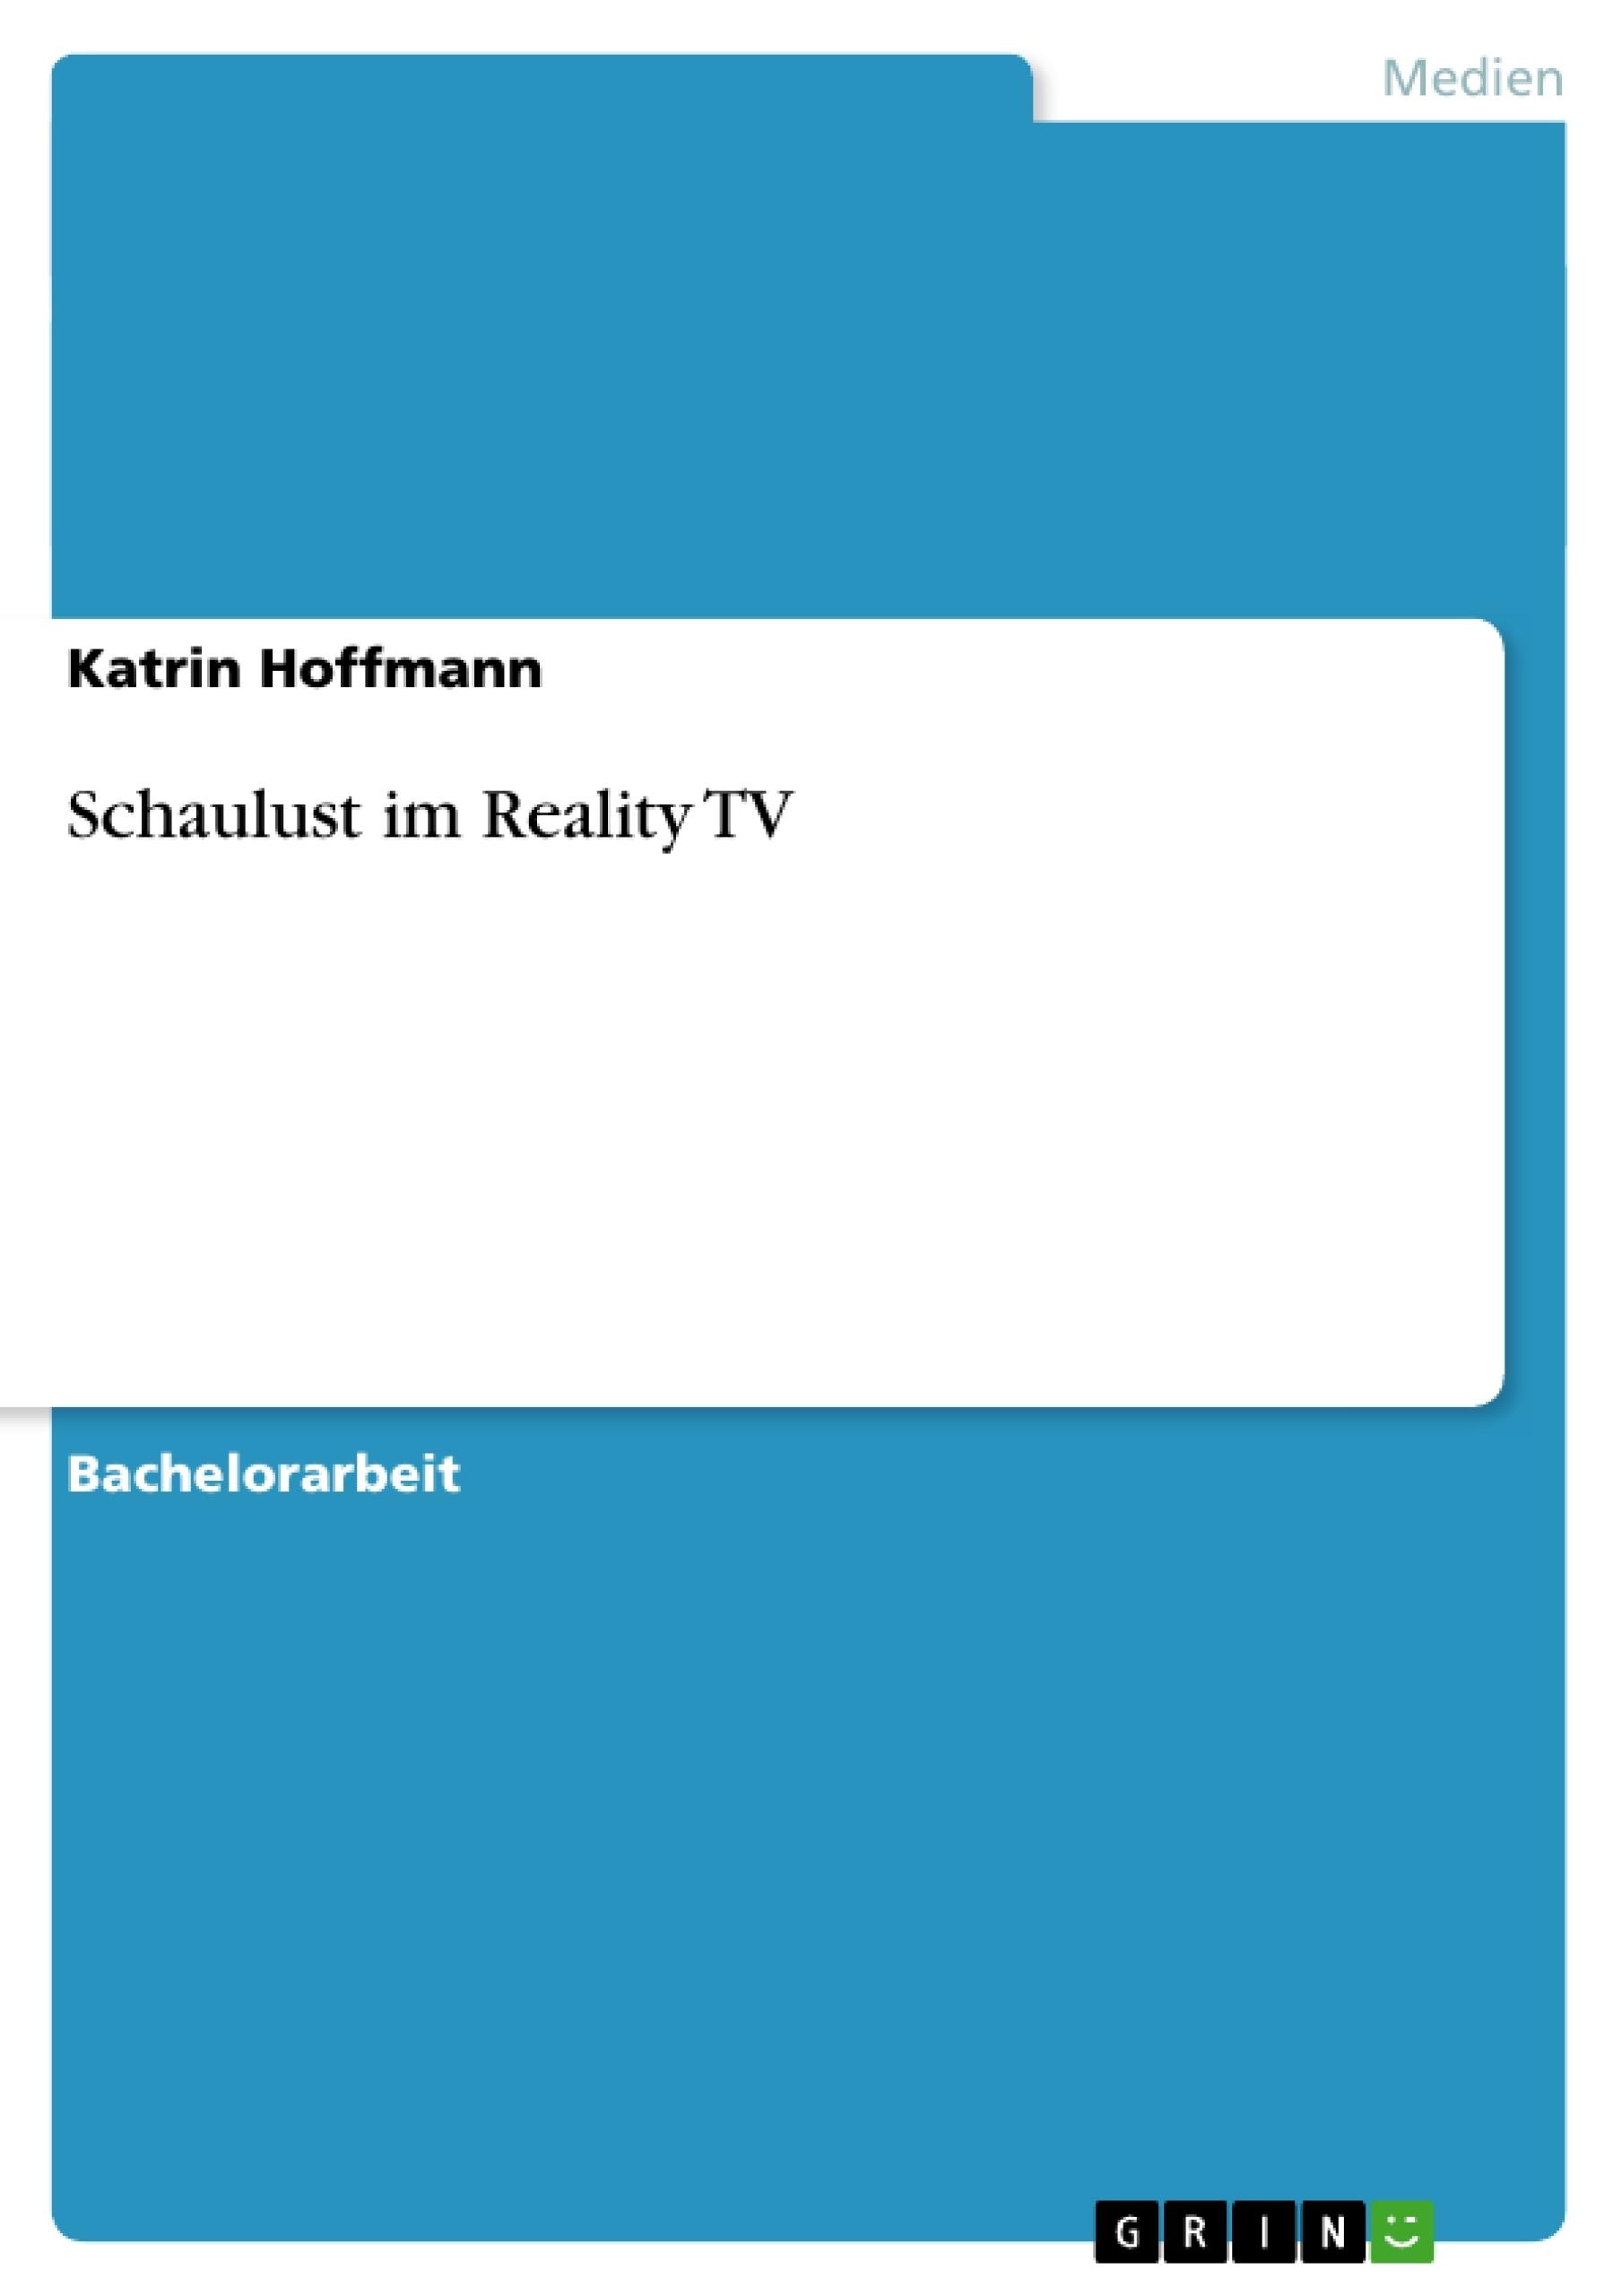 Titel: Schaulust im Reality TV